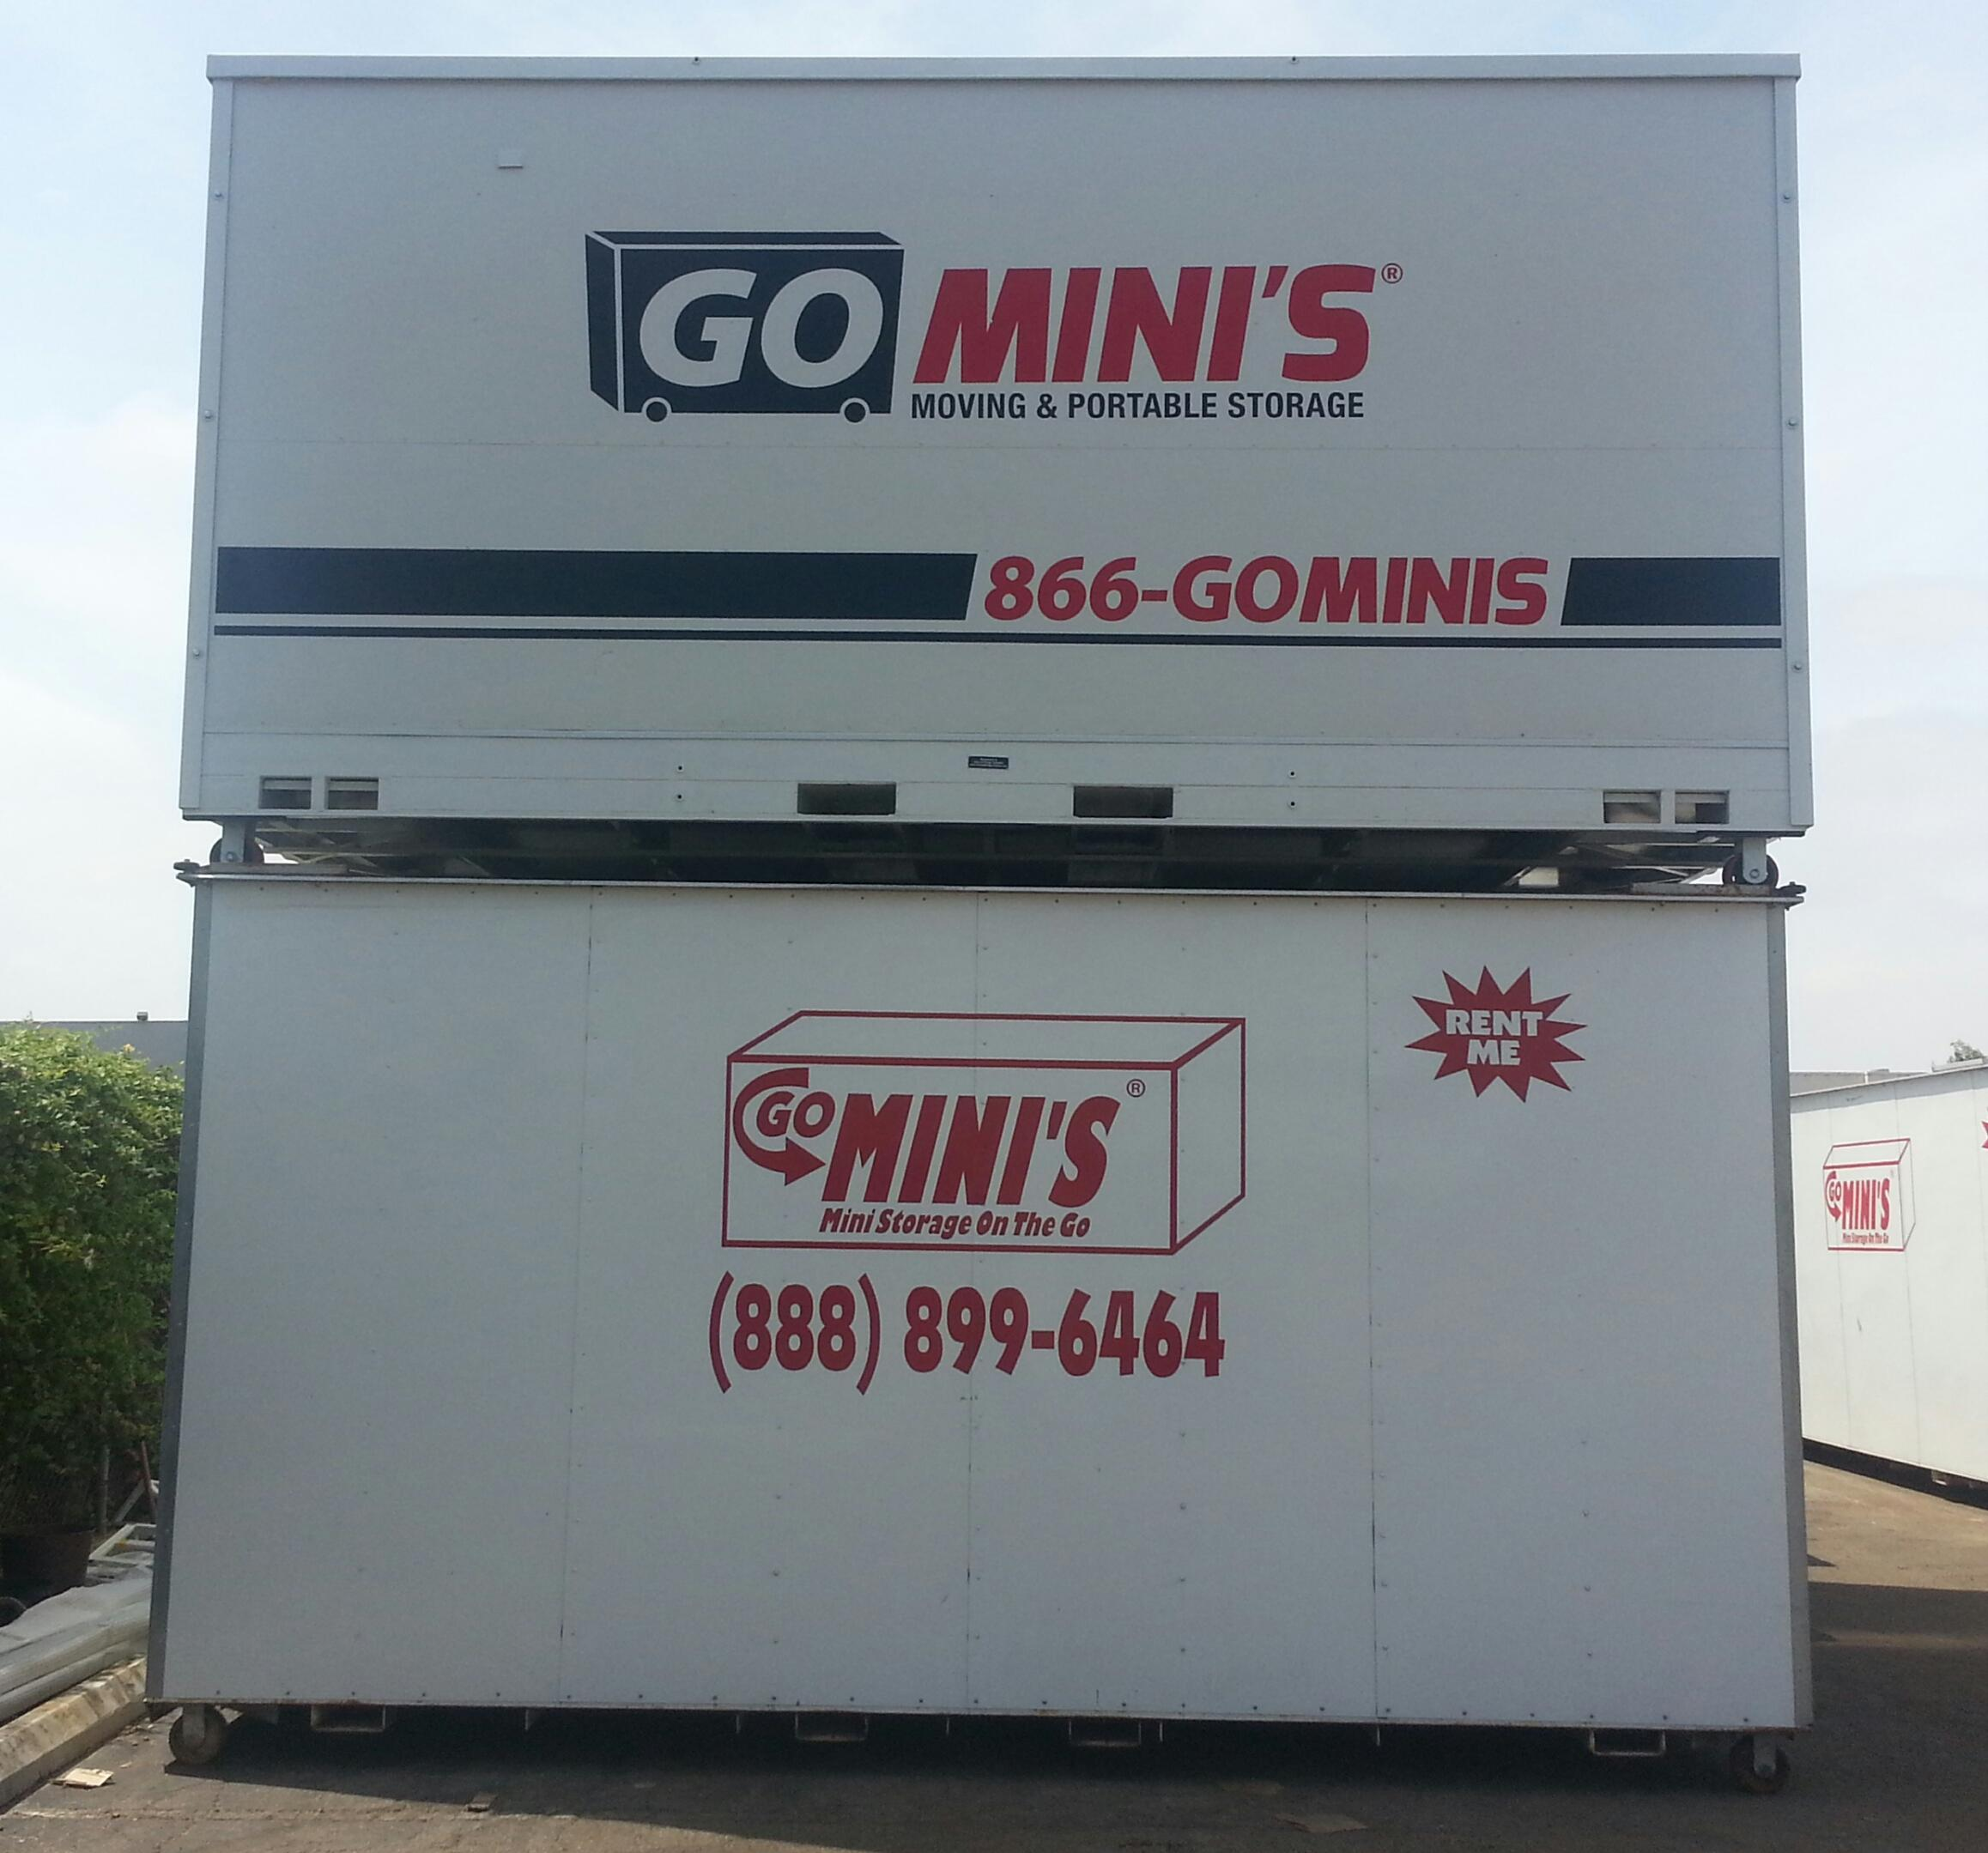 Go Mini's image 3